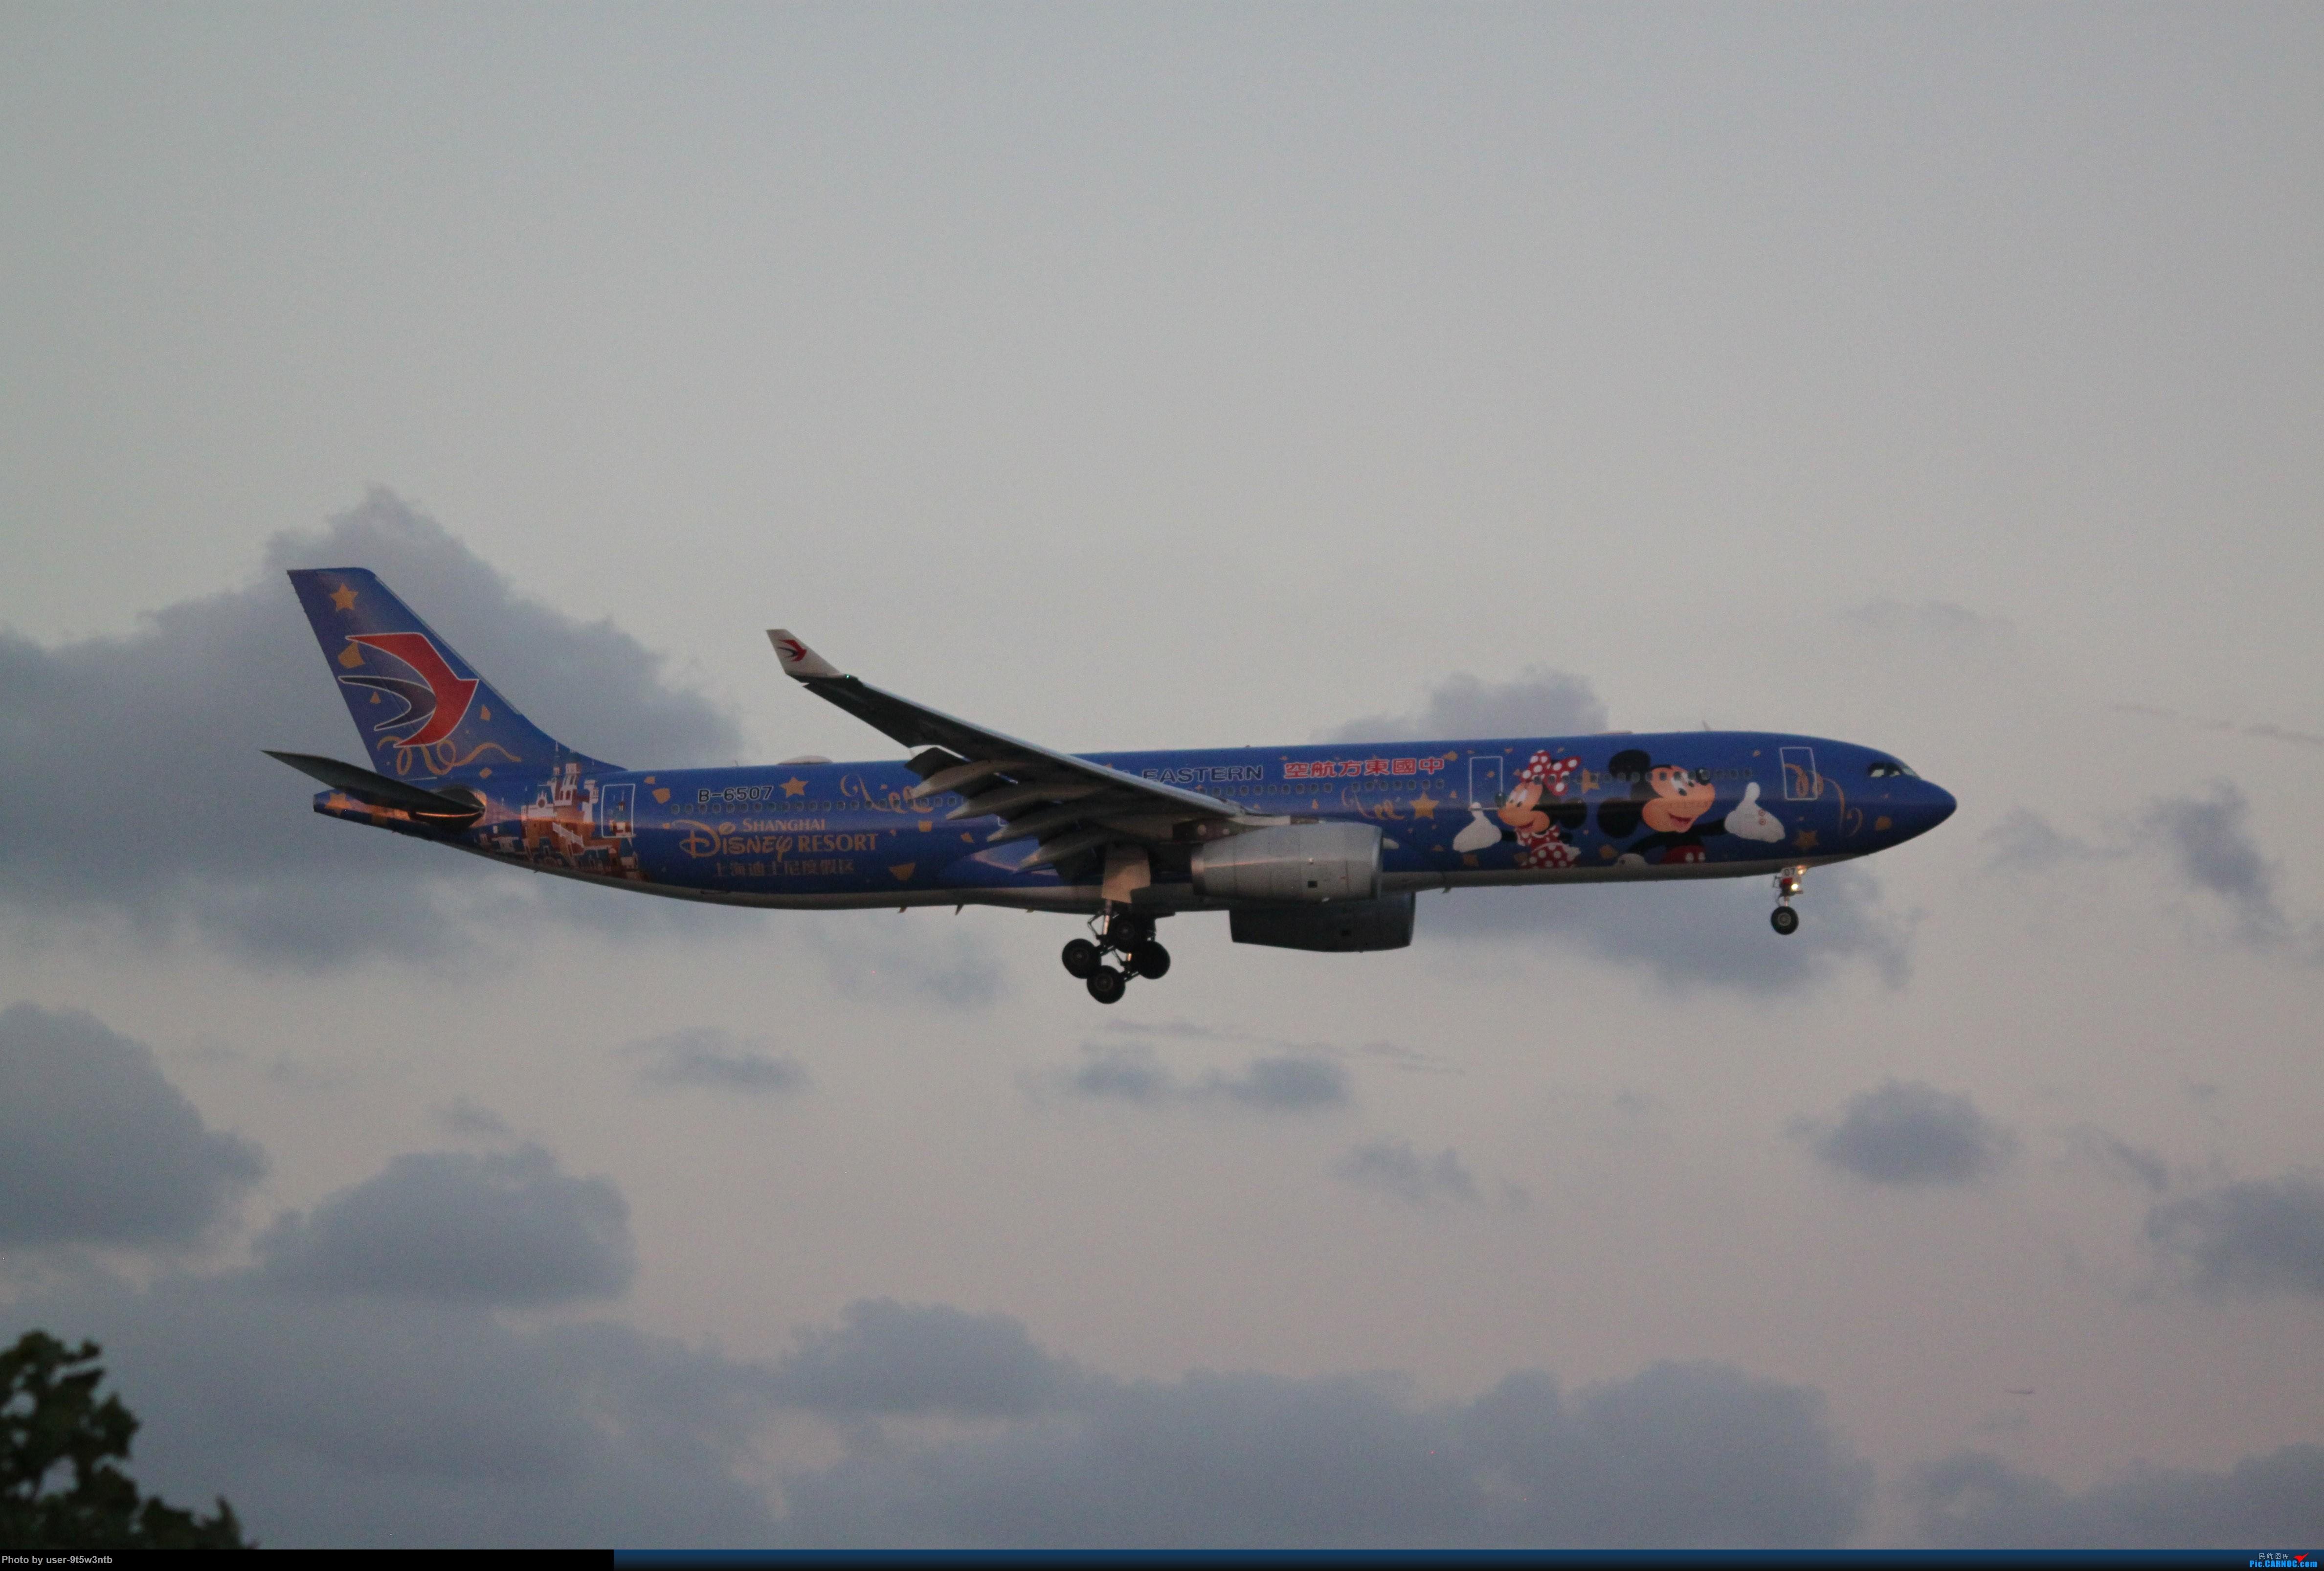 Re:[原创]来整理下最近在虹桥拍到的彩绘机吧~ AIRBUS A330-300 B-6507 中国上海虹桥国际机场